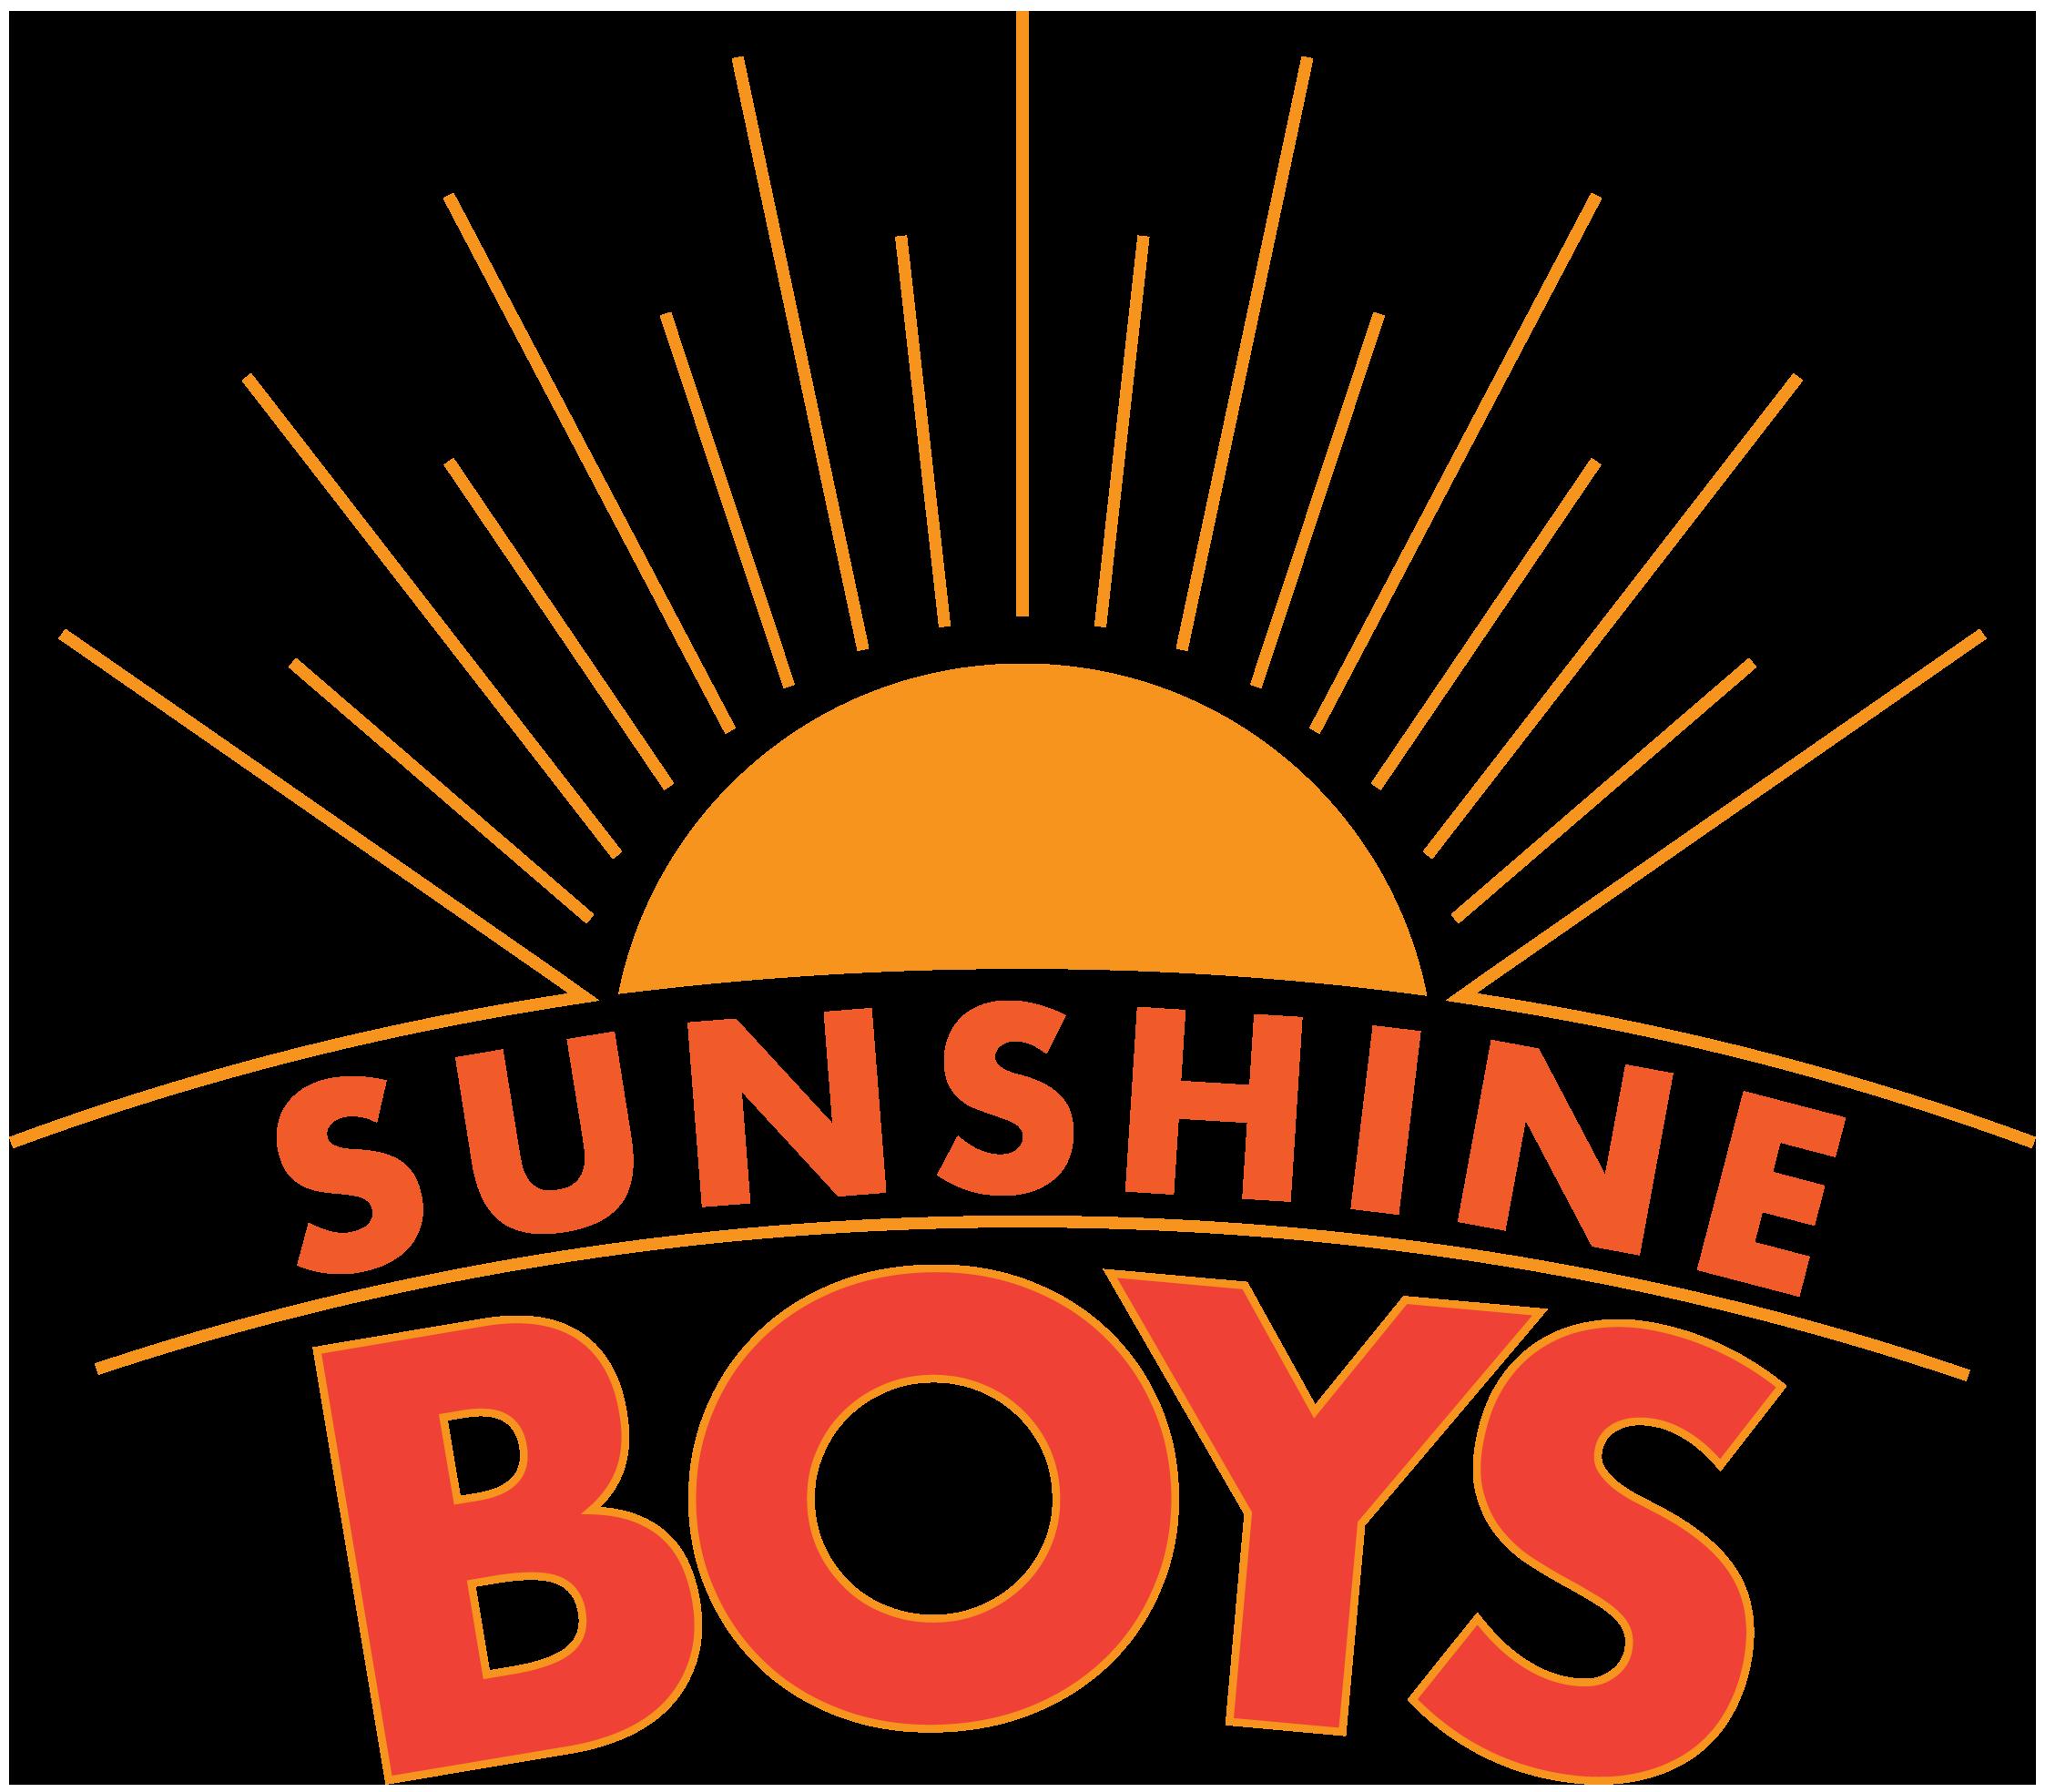 sunshineBoys.png